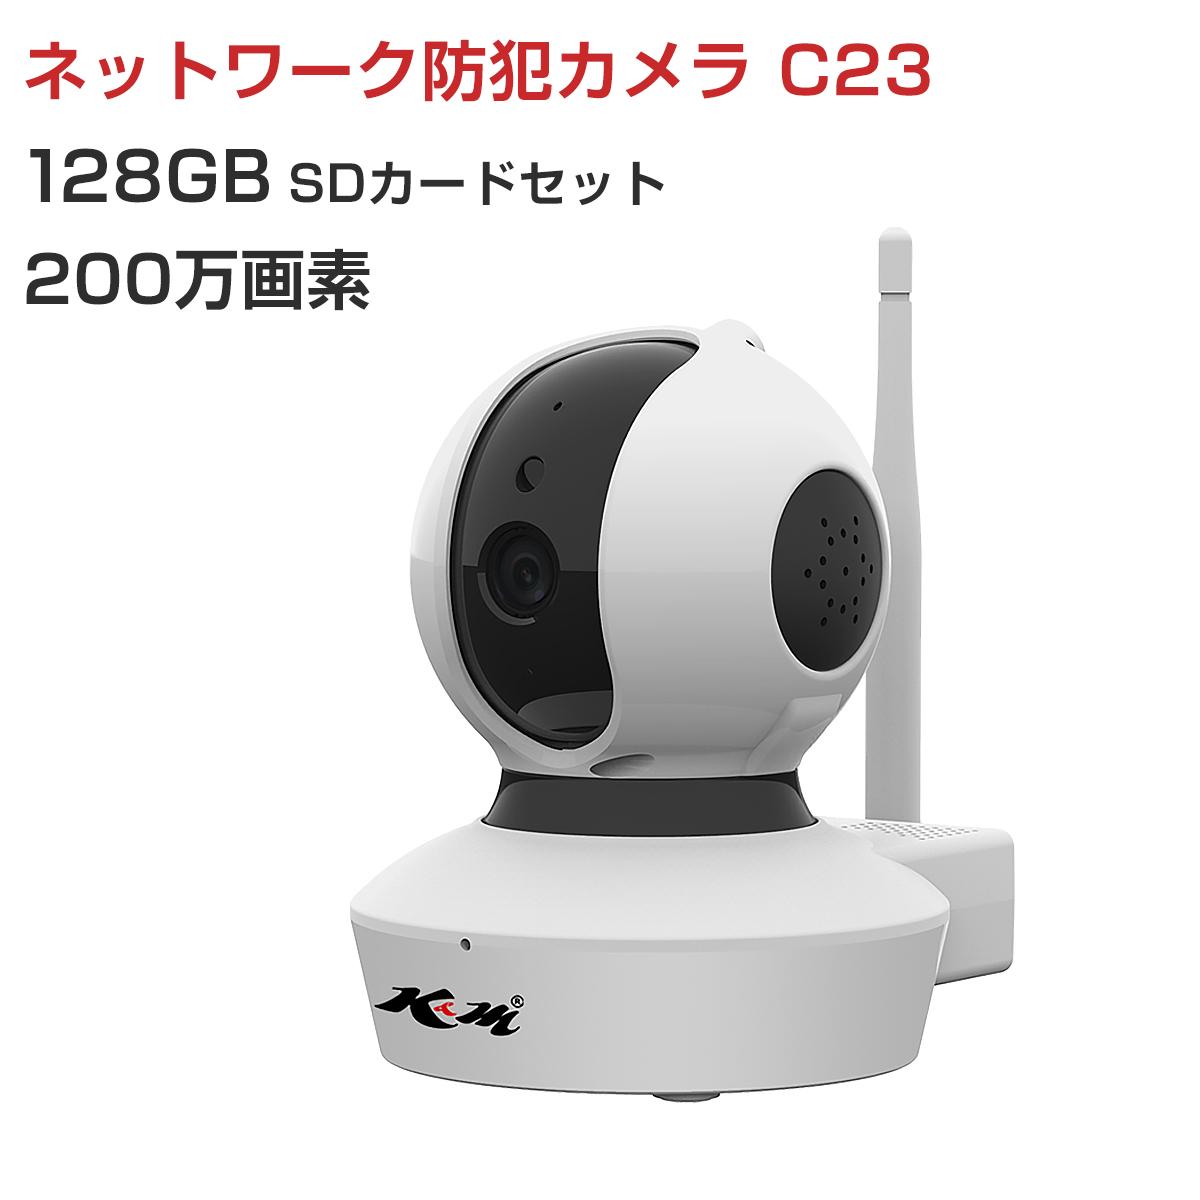 SSL 防犯カメラ 200万画素 C7823 新モデル SDカード128GB同梱モデル ベビー ペットモニター VStarcam ワイヤレス 無線WIFI MicroSDカード録画 屋内用 監視 ネットワーク IP WEB カメラ 宅配便送料無料 PSE 技適 1年保証 K&M